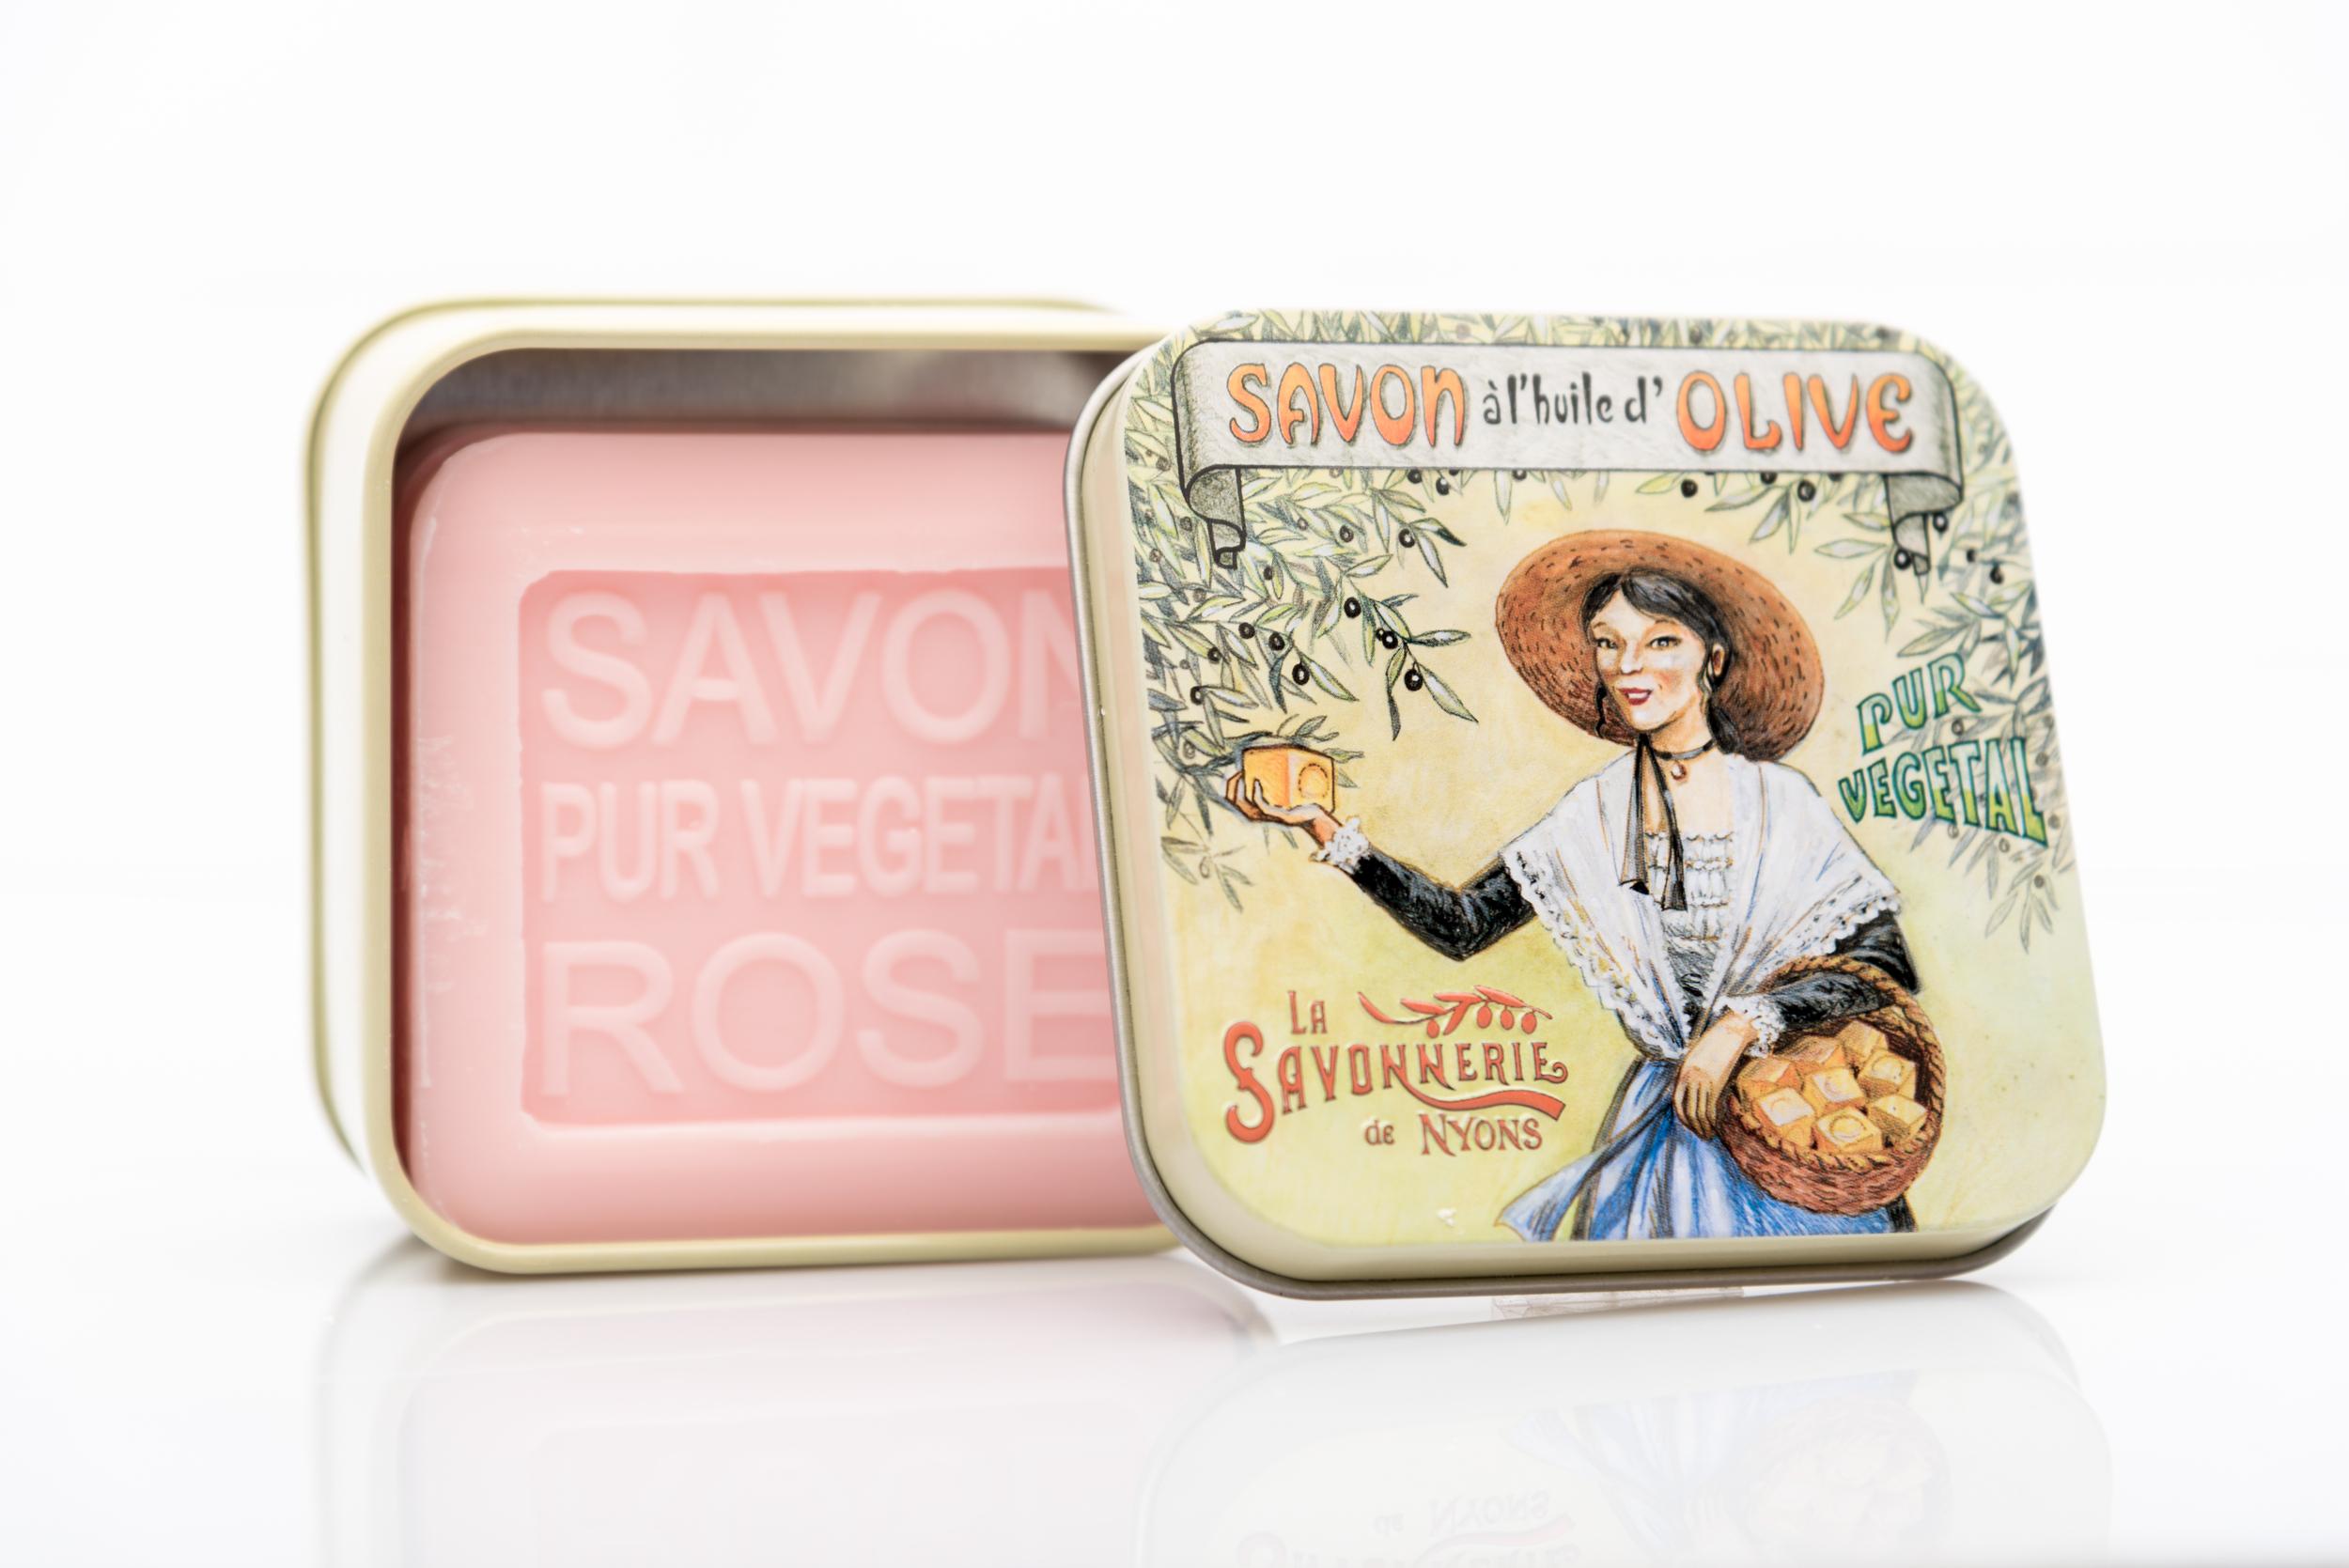 SAVON DE NYONS VEGETAL MADE IN FRANCE AVEC BOITE METALIQUE MODELE 8 A LA ROSE